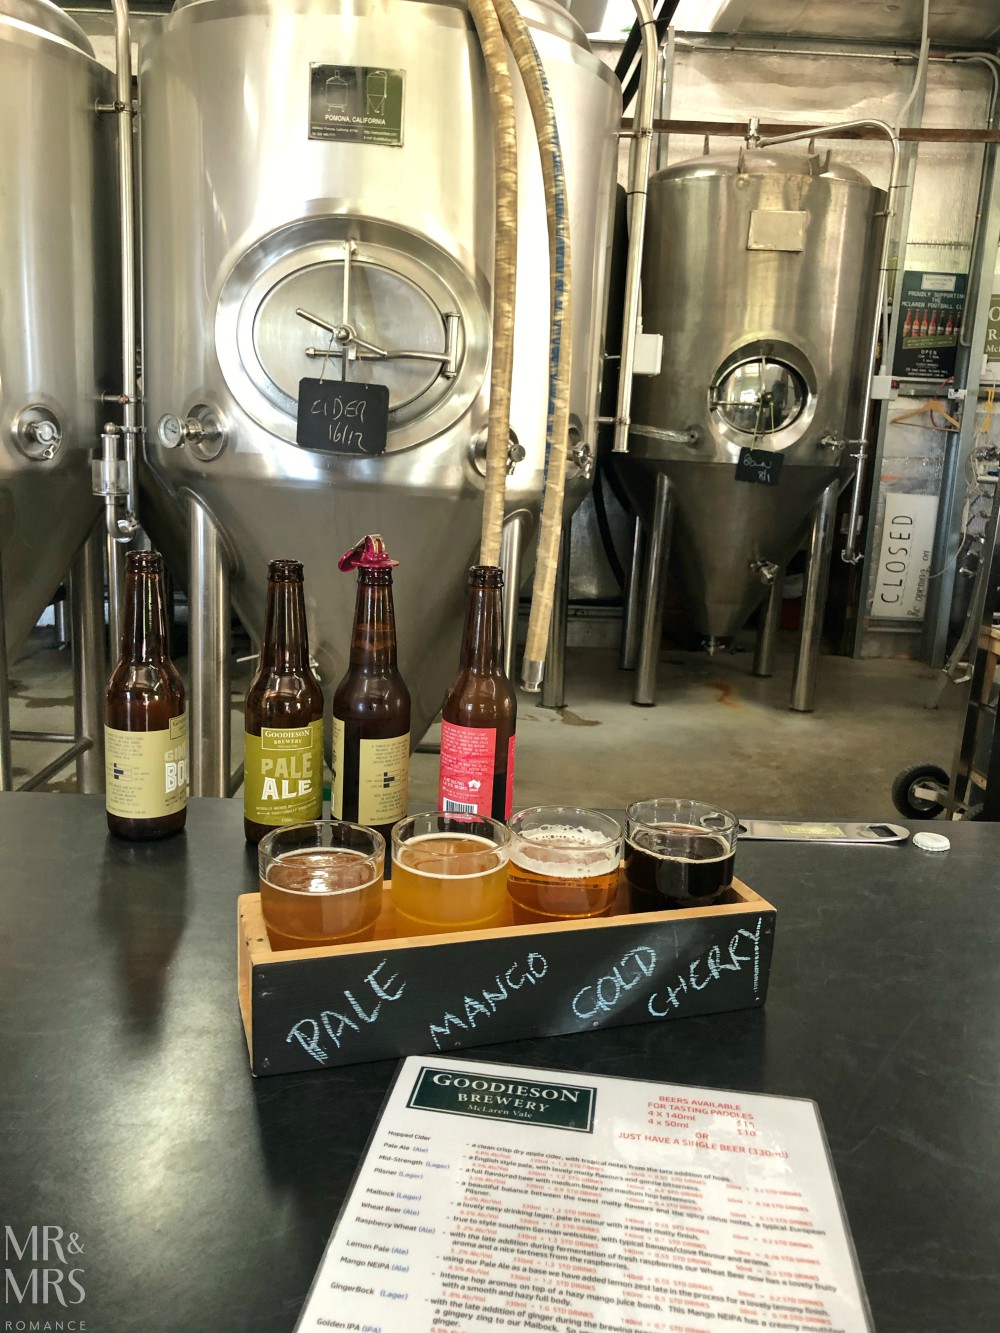 Goodieson Brewery, McLaren Vale, Adelaide